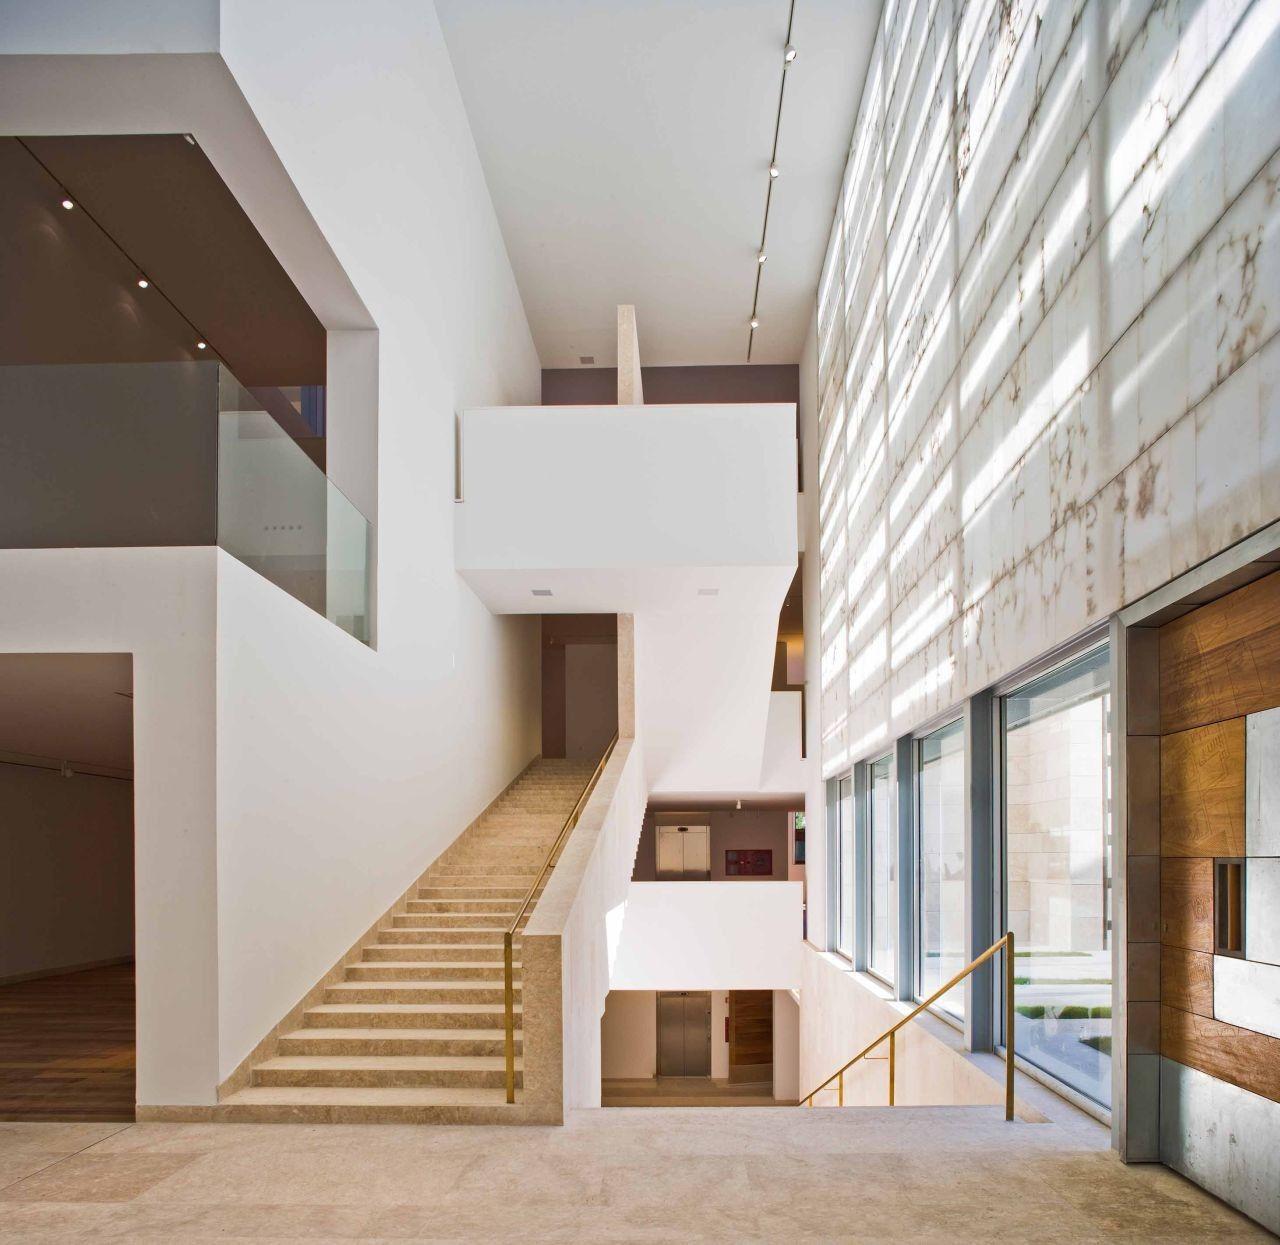 Gallery of Museo Arqueologico de Oviedo / PardoTapia Arquitectos - 4